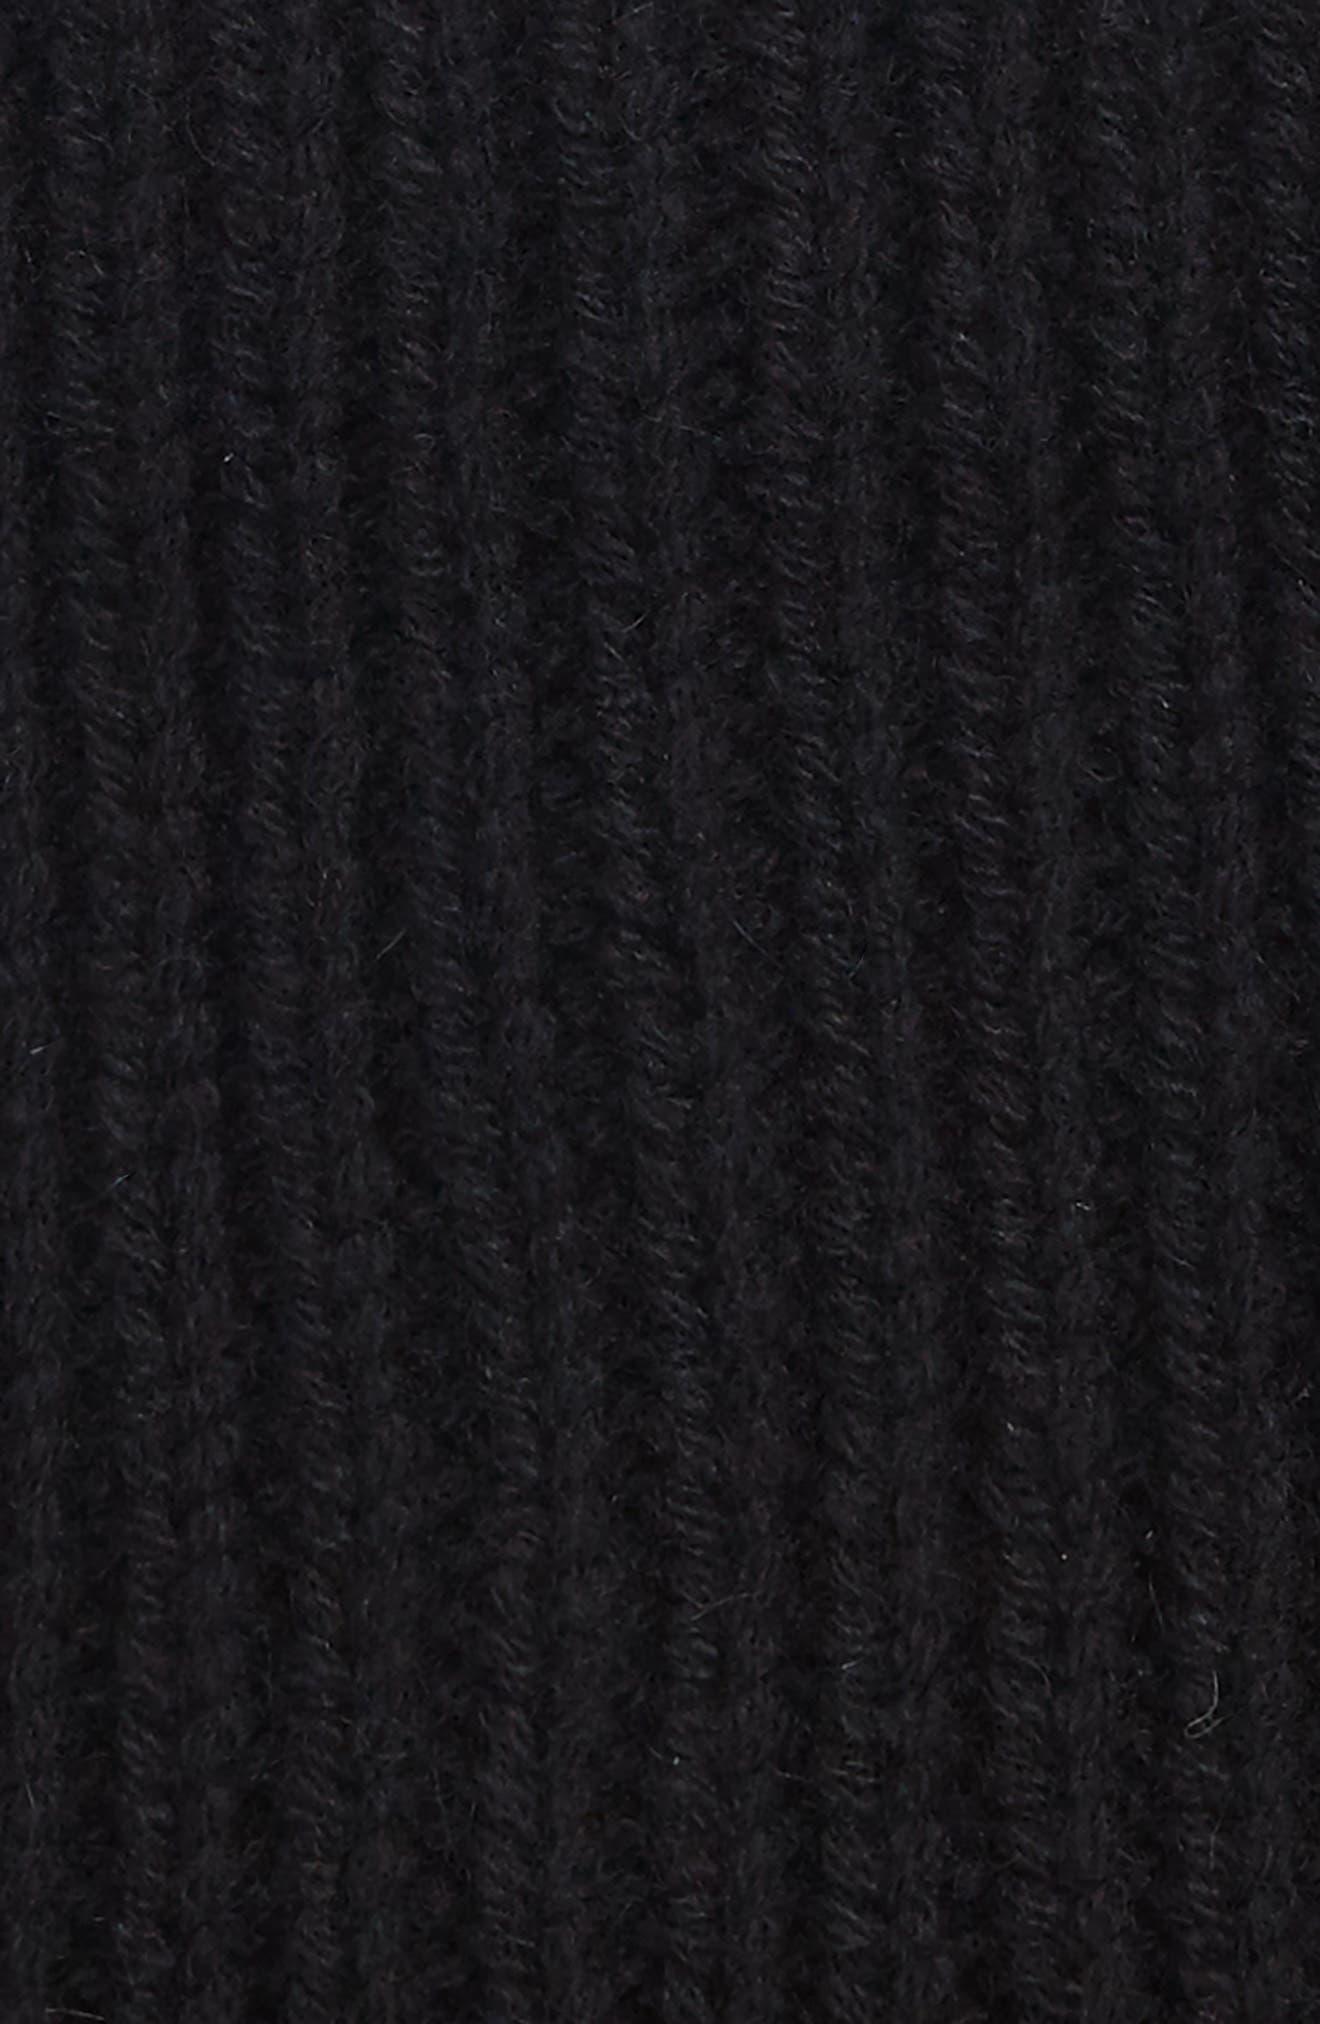 Cardi Wool Blend Beanie,                             Alternate thumbnail 2, color,                             001